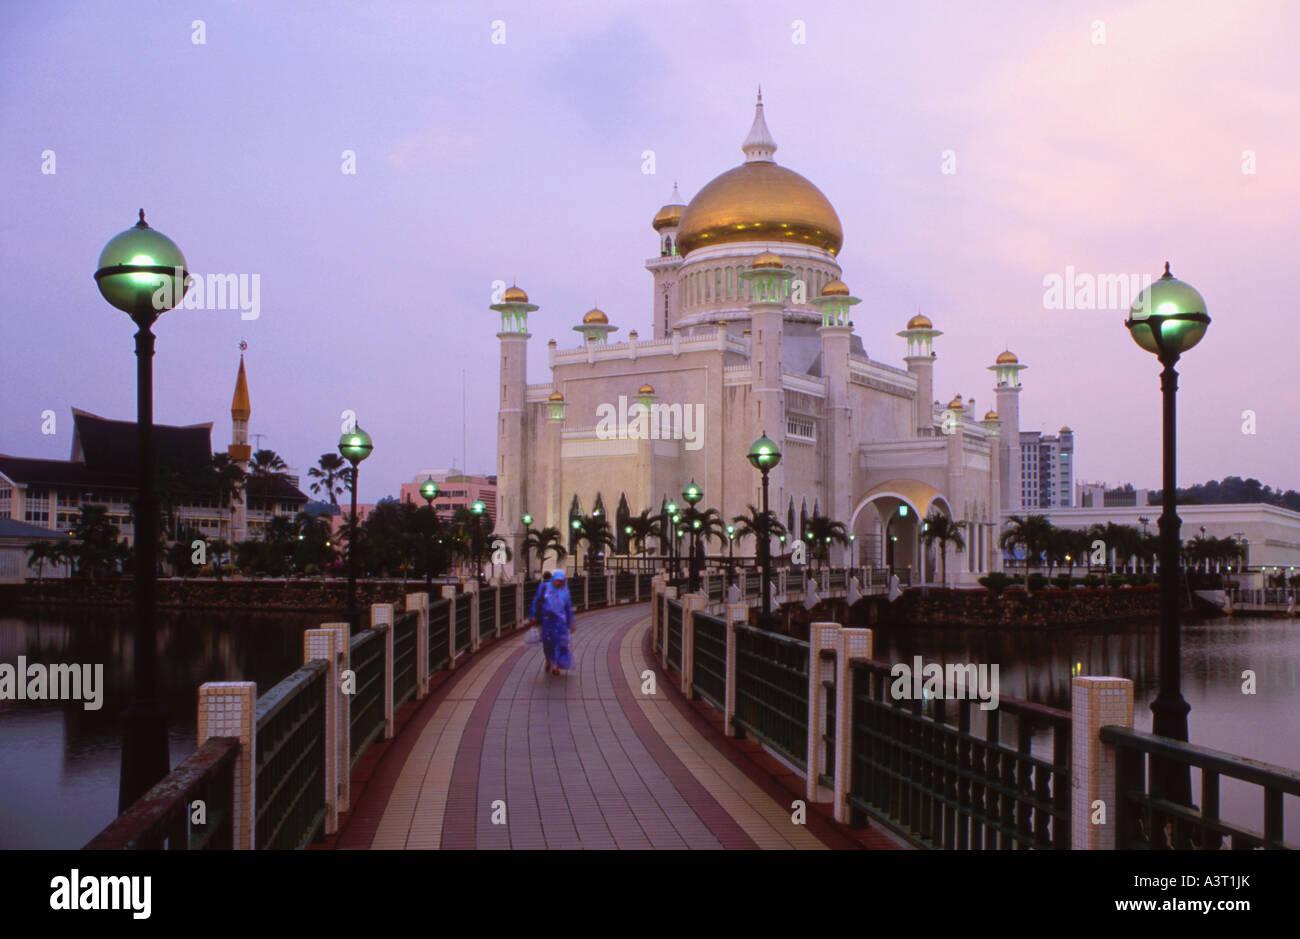 Muslim woman leaving the Omar Ali Saifuddin Mosque in Bandar Seri Begawan Brunei - Stock Image